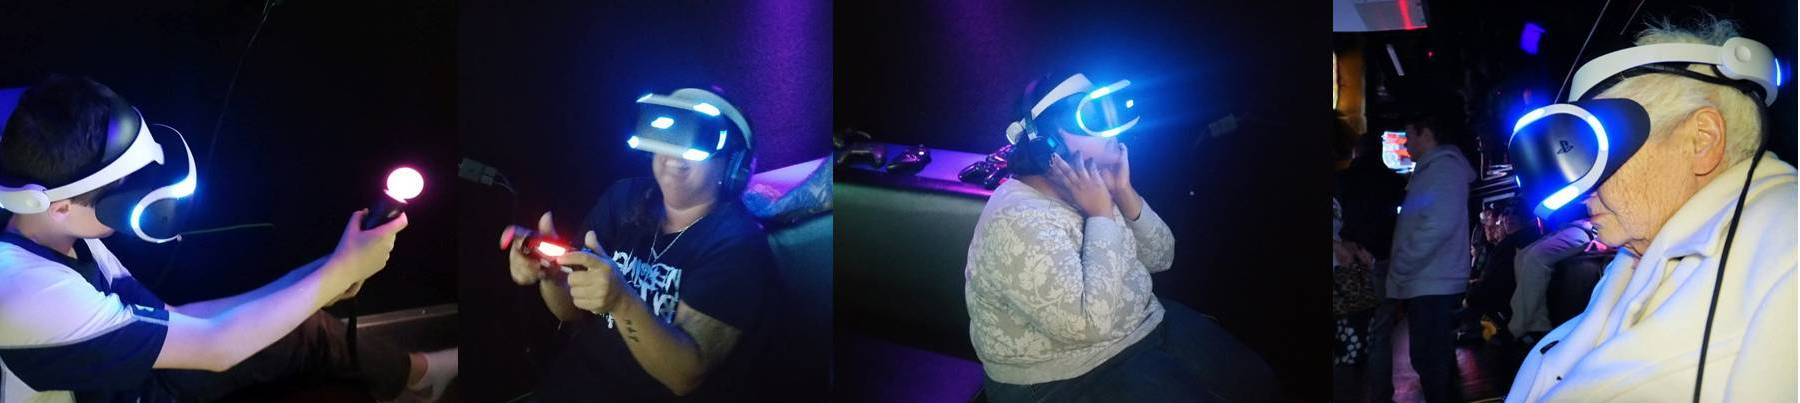 Virtual reality video game truck party in San Bernardino County